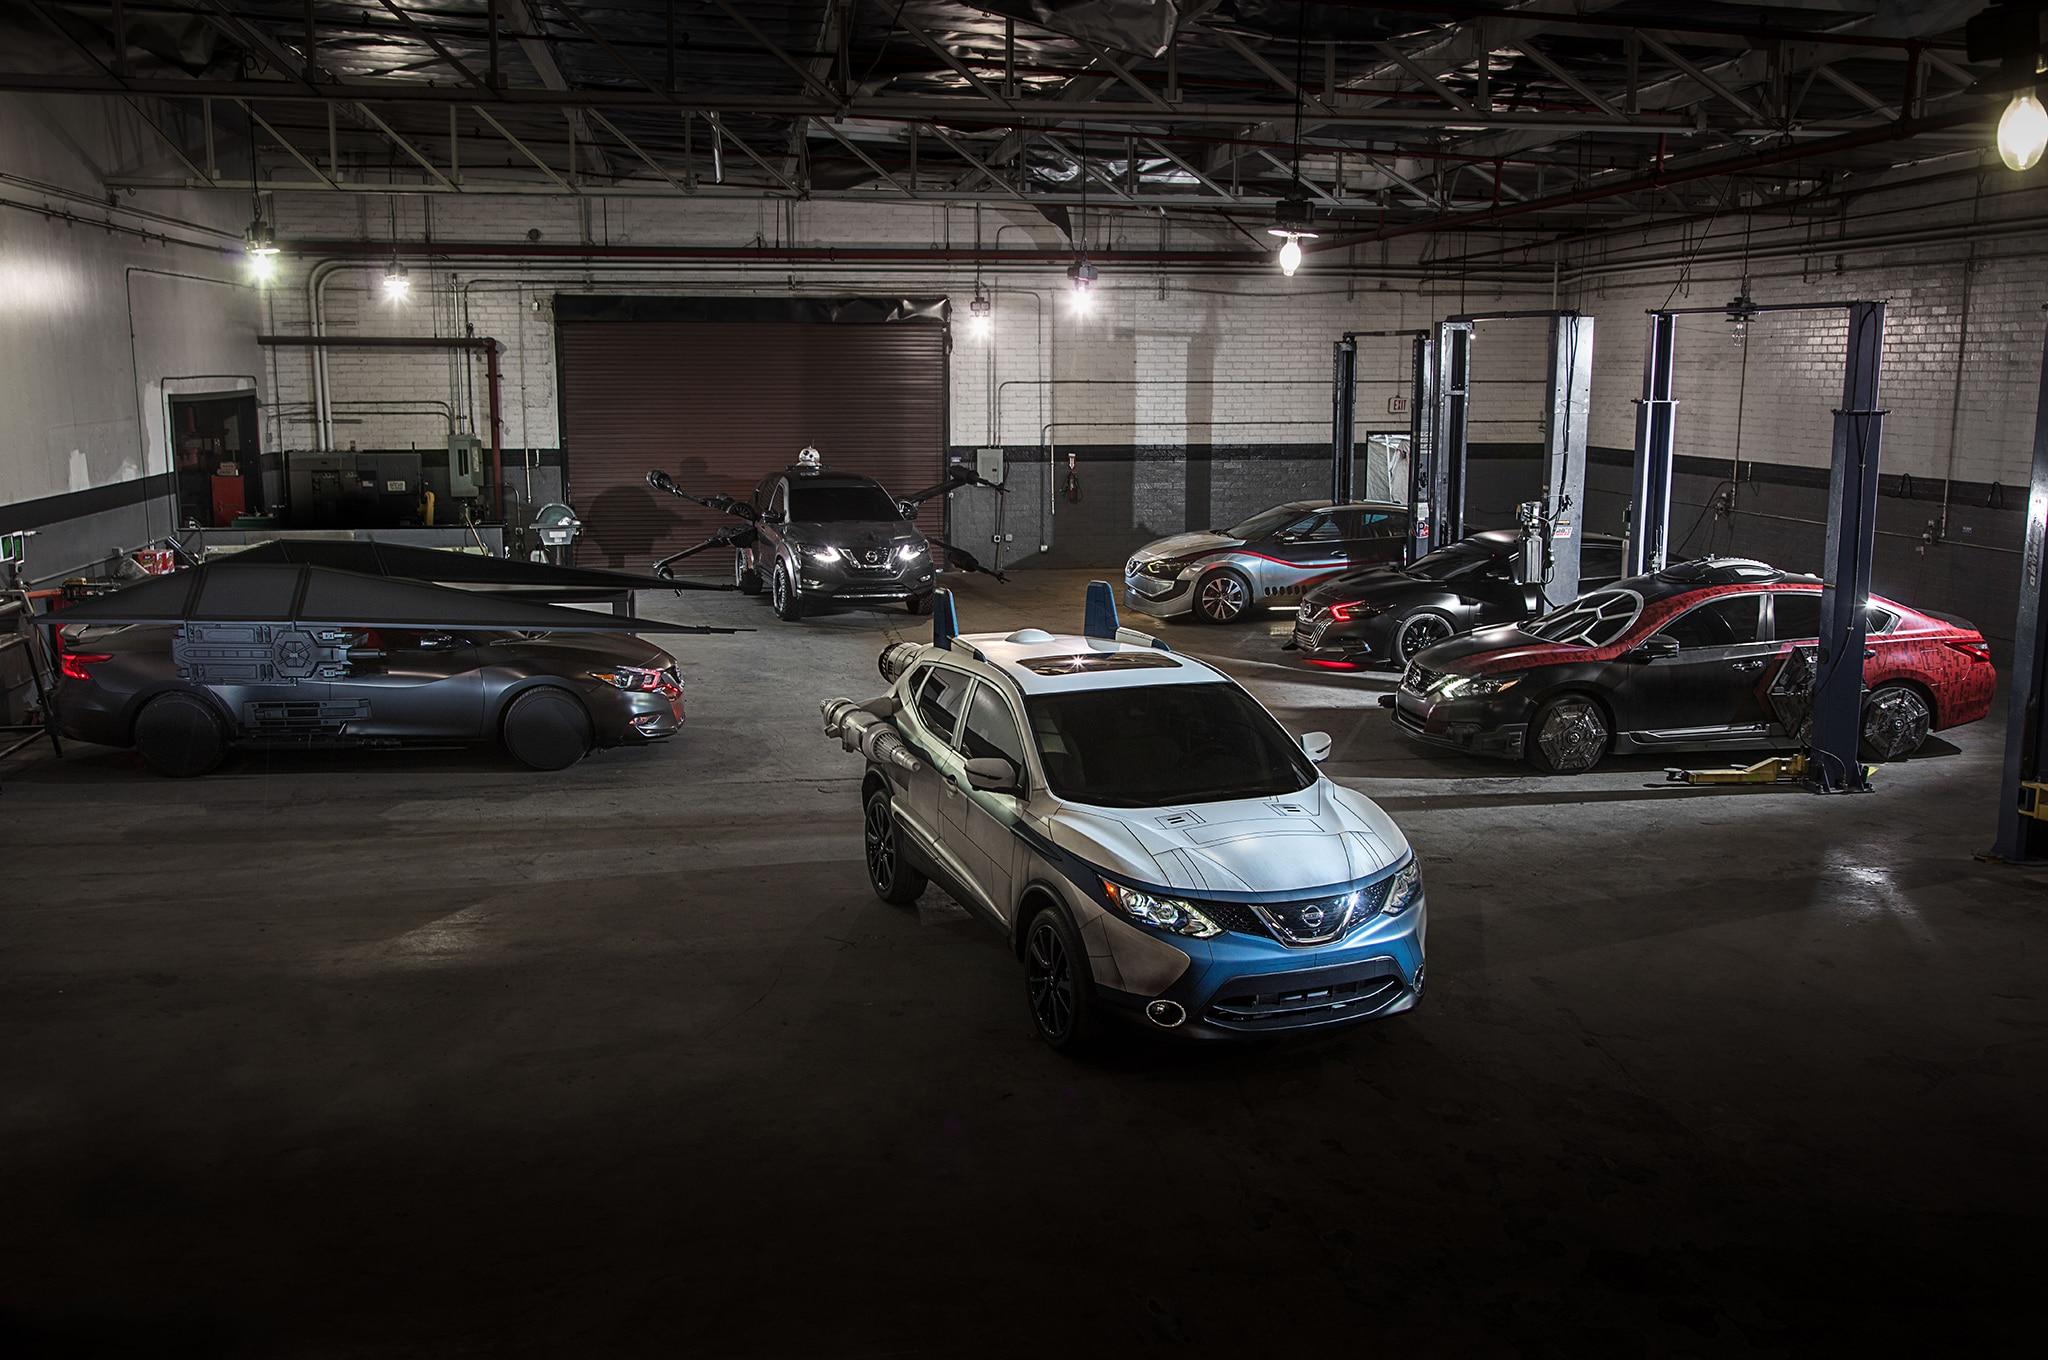 Star Wars Nissan Show Cars